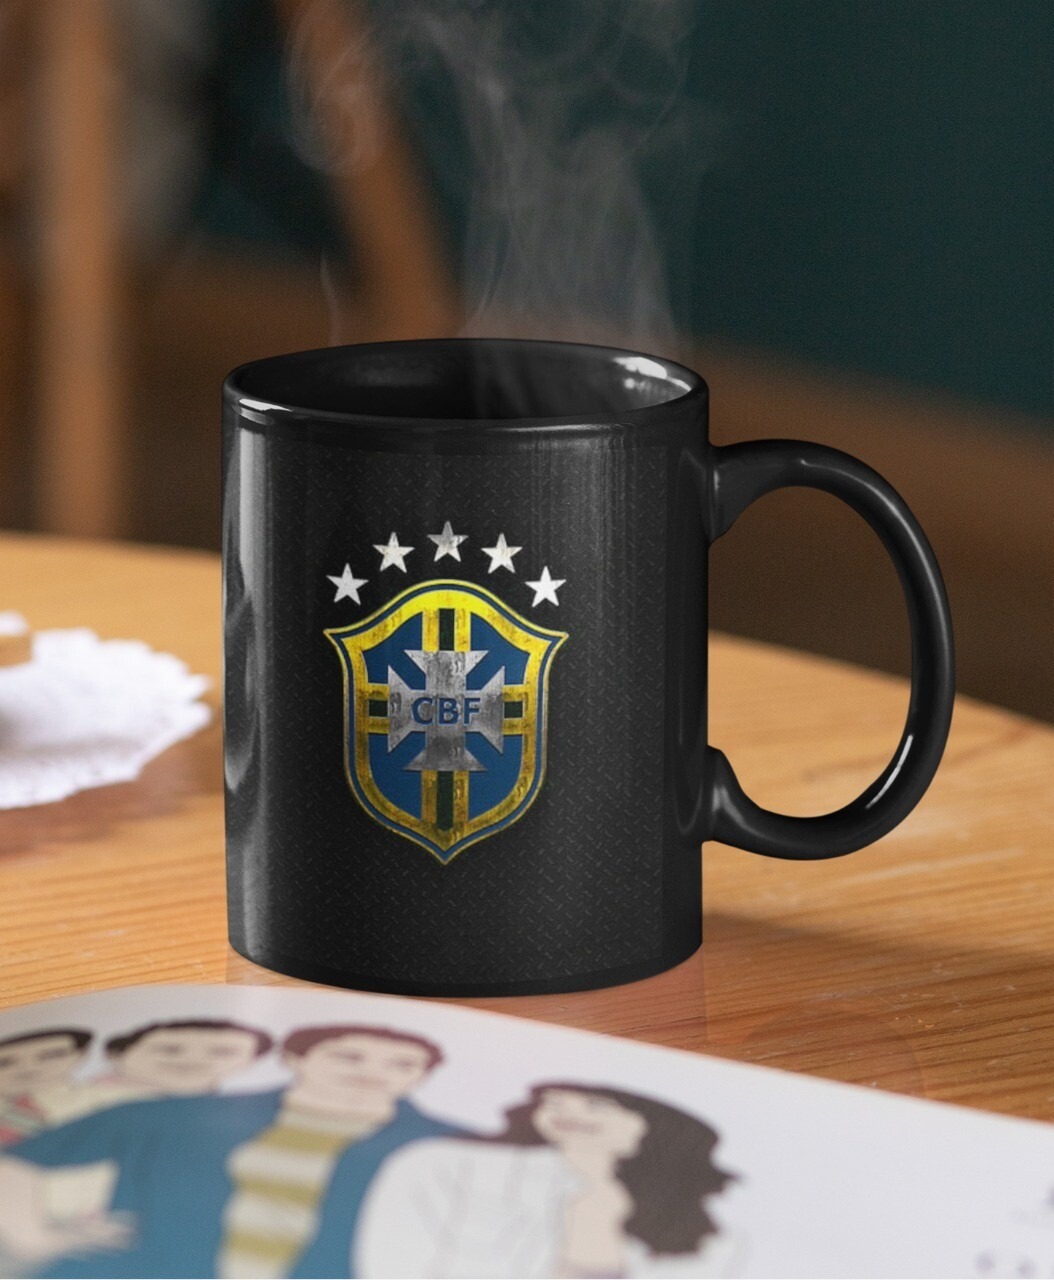 Brazil Football Team Logo Mug (Microwave and Dishwasher Safe)